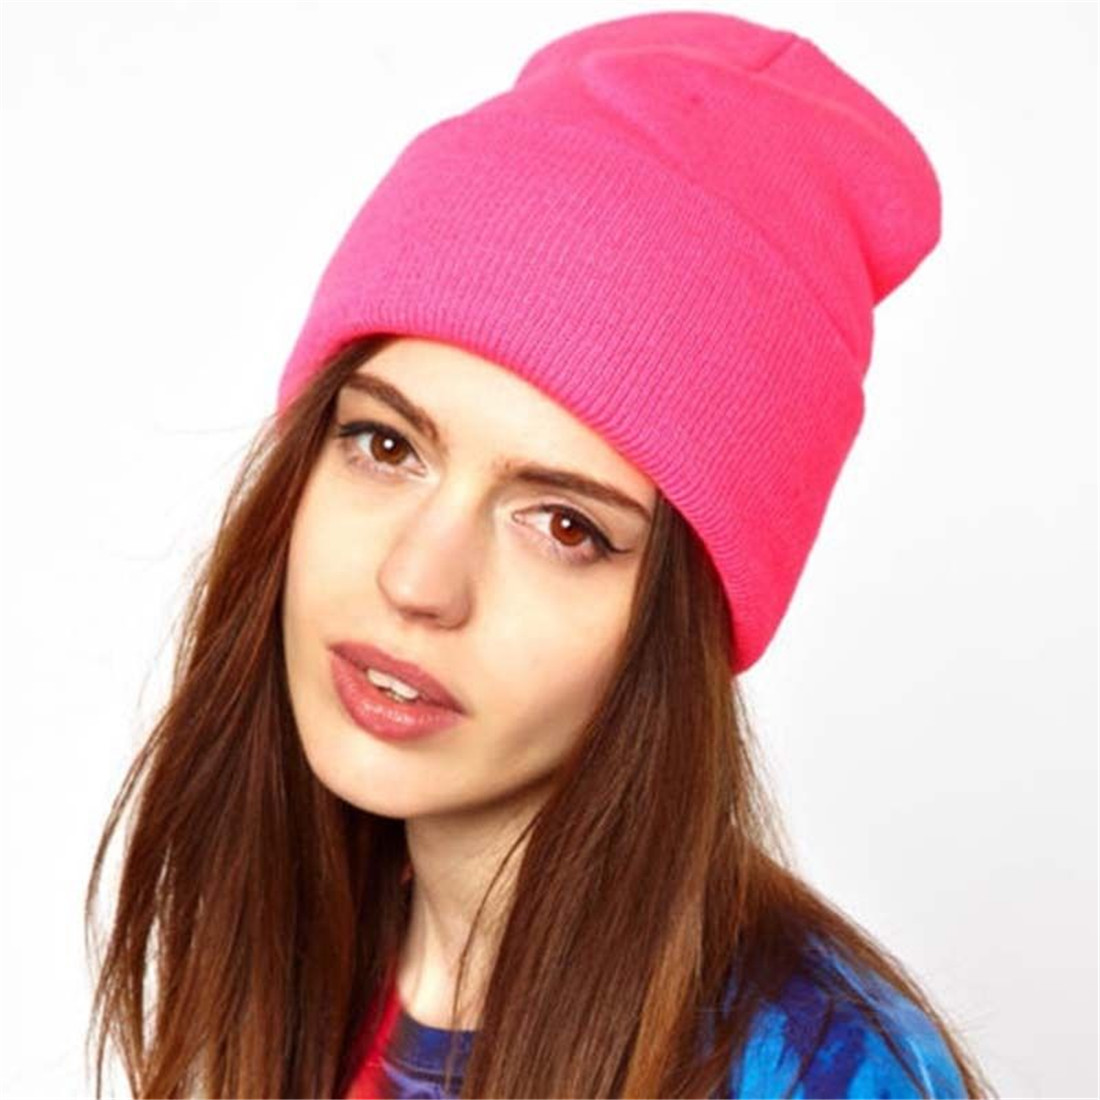 Knitted Beanie Hats Balaclava-Hats Earwarmer Black Winter White Women's A-Cap Female